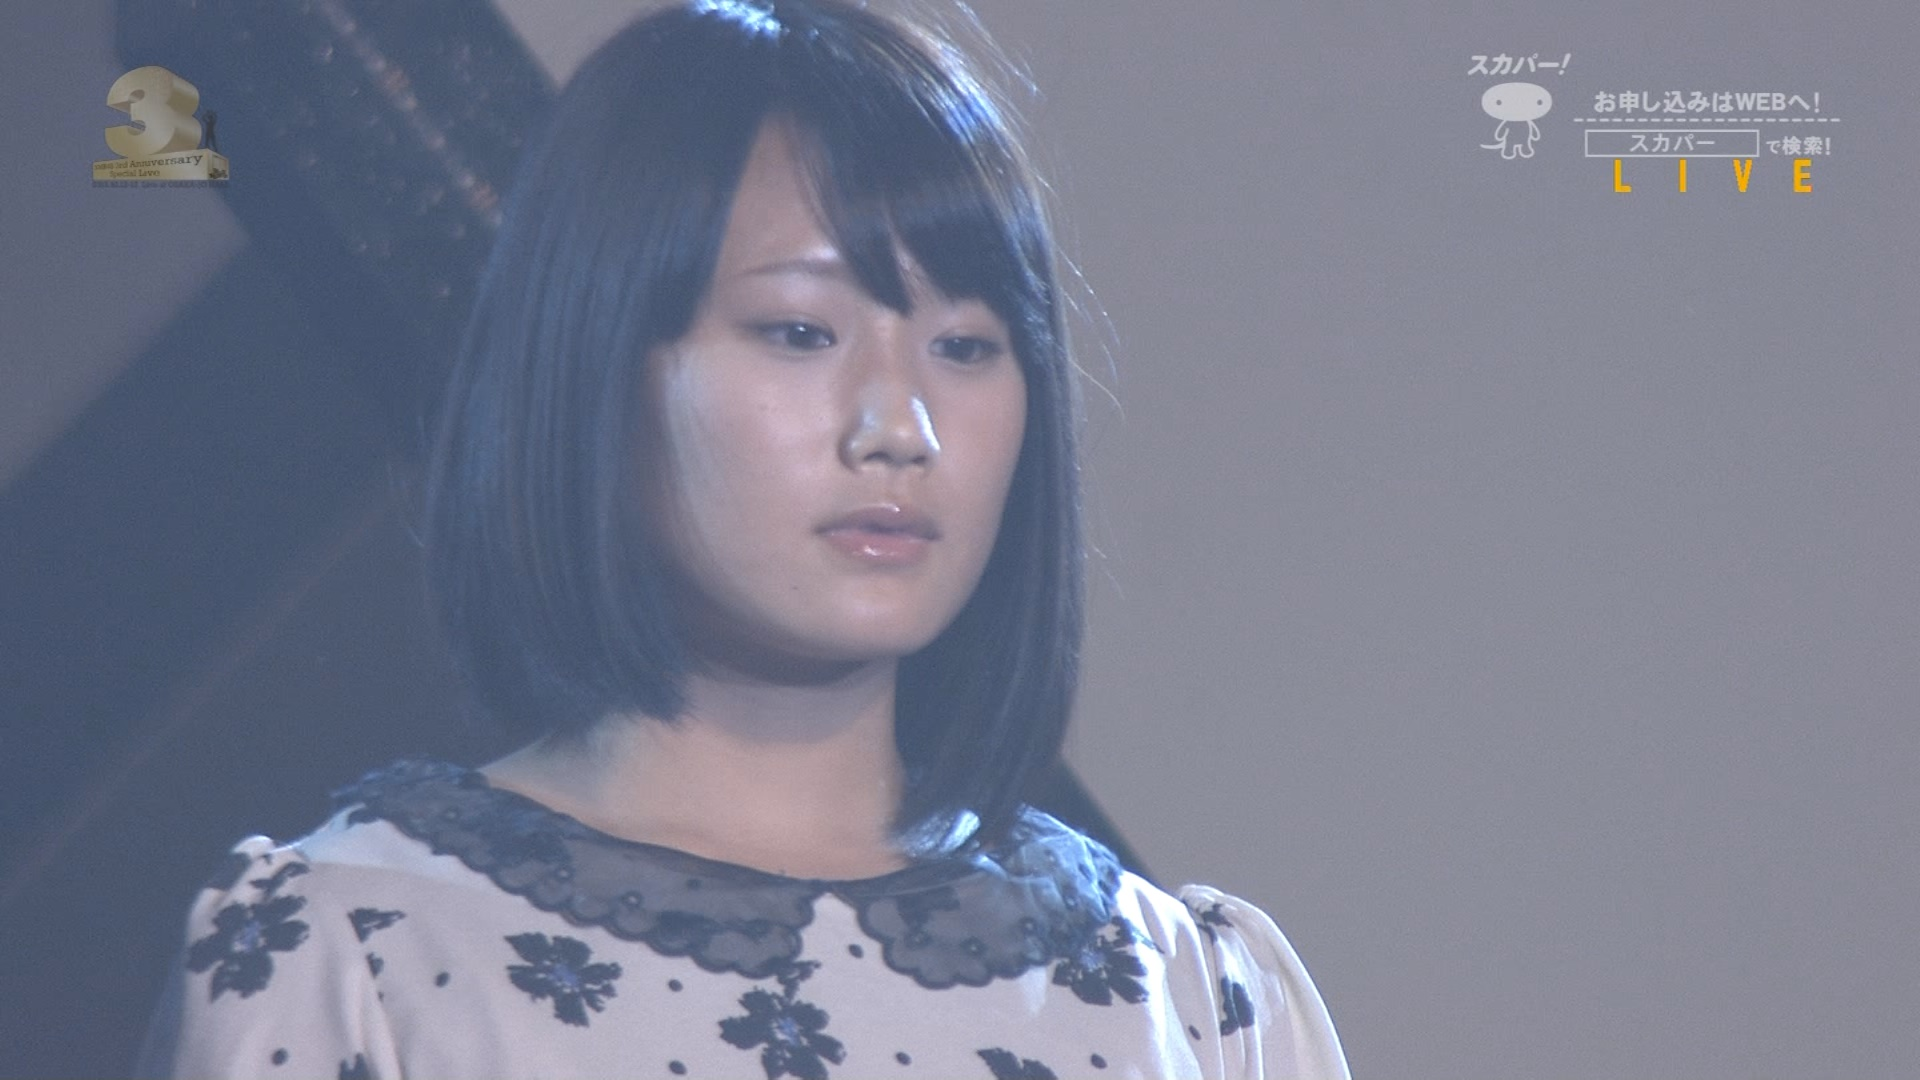 【NMB48】城恵理子応援スレ★40【まだ残るジョー】YouTube動画>8本 ->画像>297枚